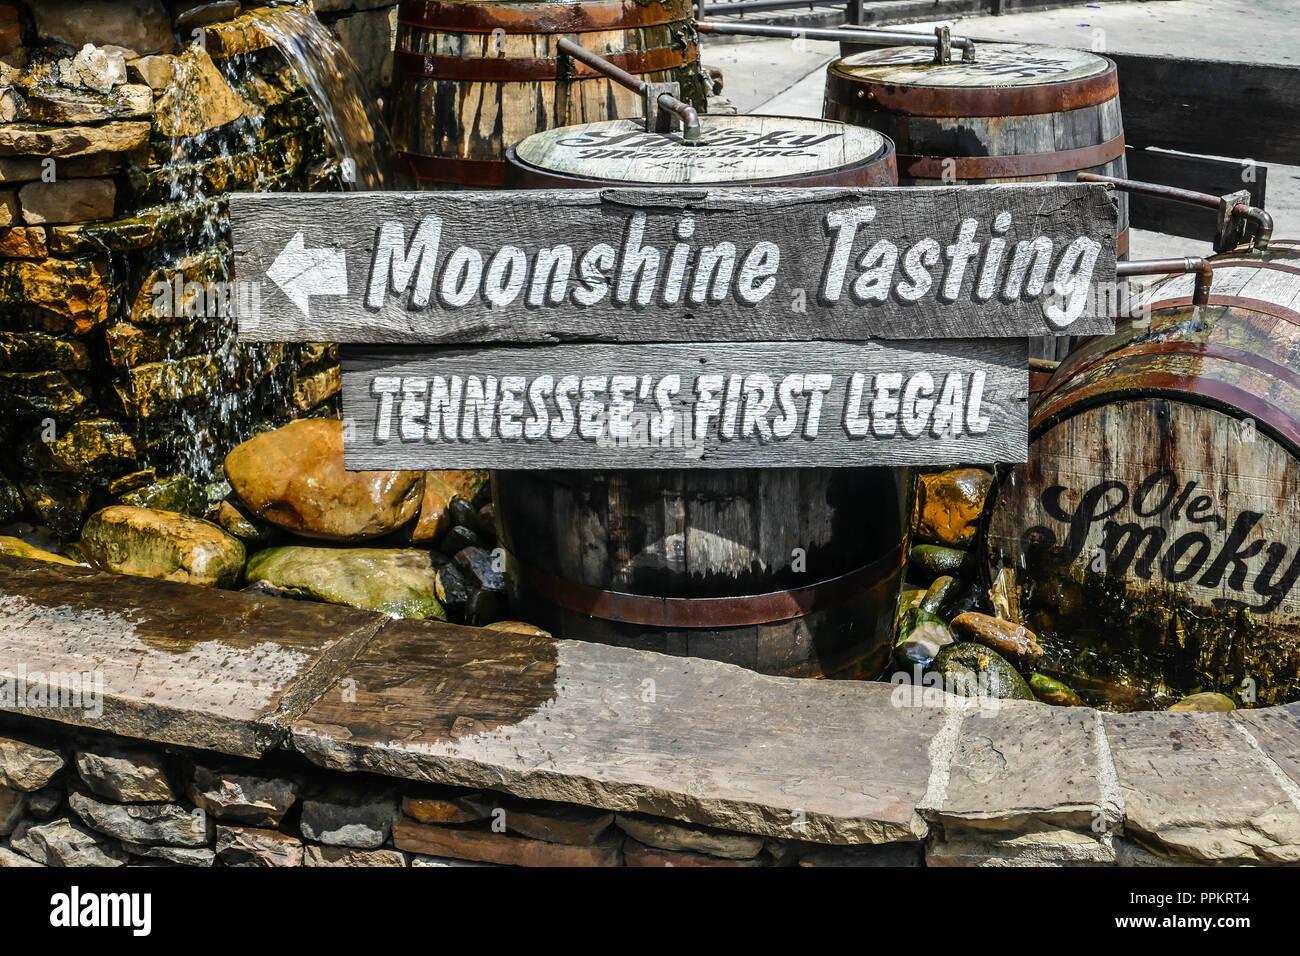 GATLINBURG-AUGUST 8:  Ole Smoky Moonshine tasting sign close up on street in Gatlinburg, Tennessee, USA on August 8, 2016. - Stock Image